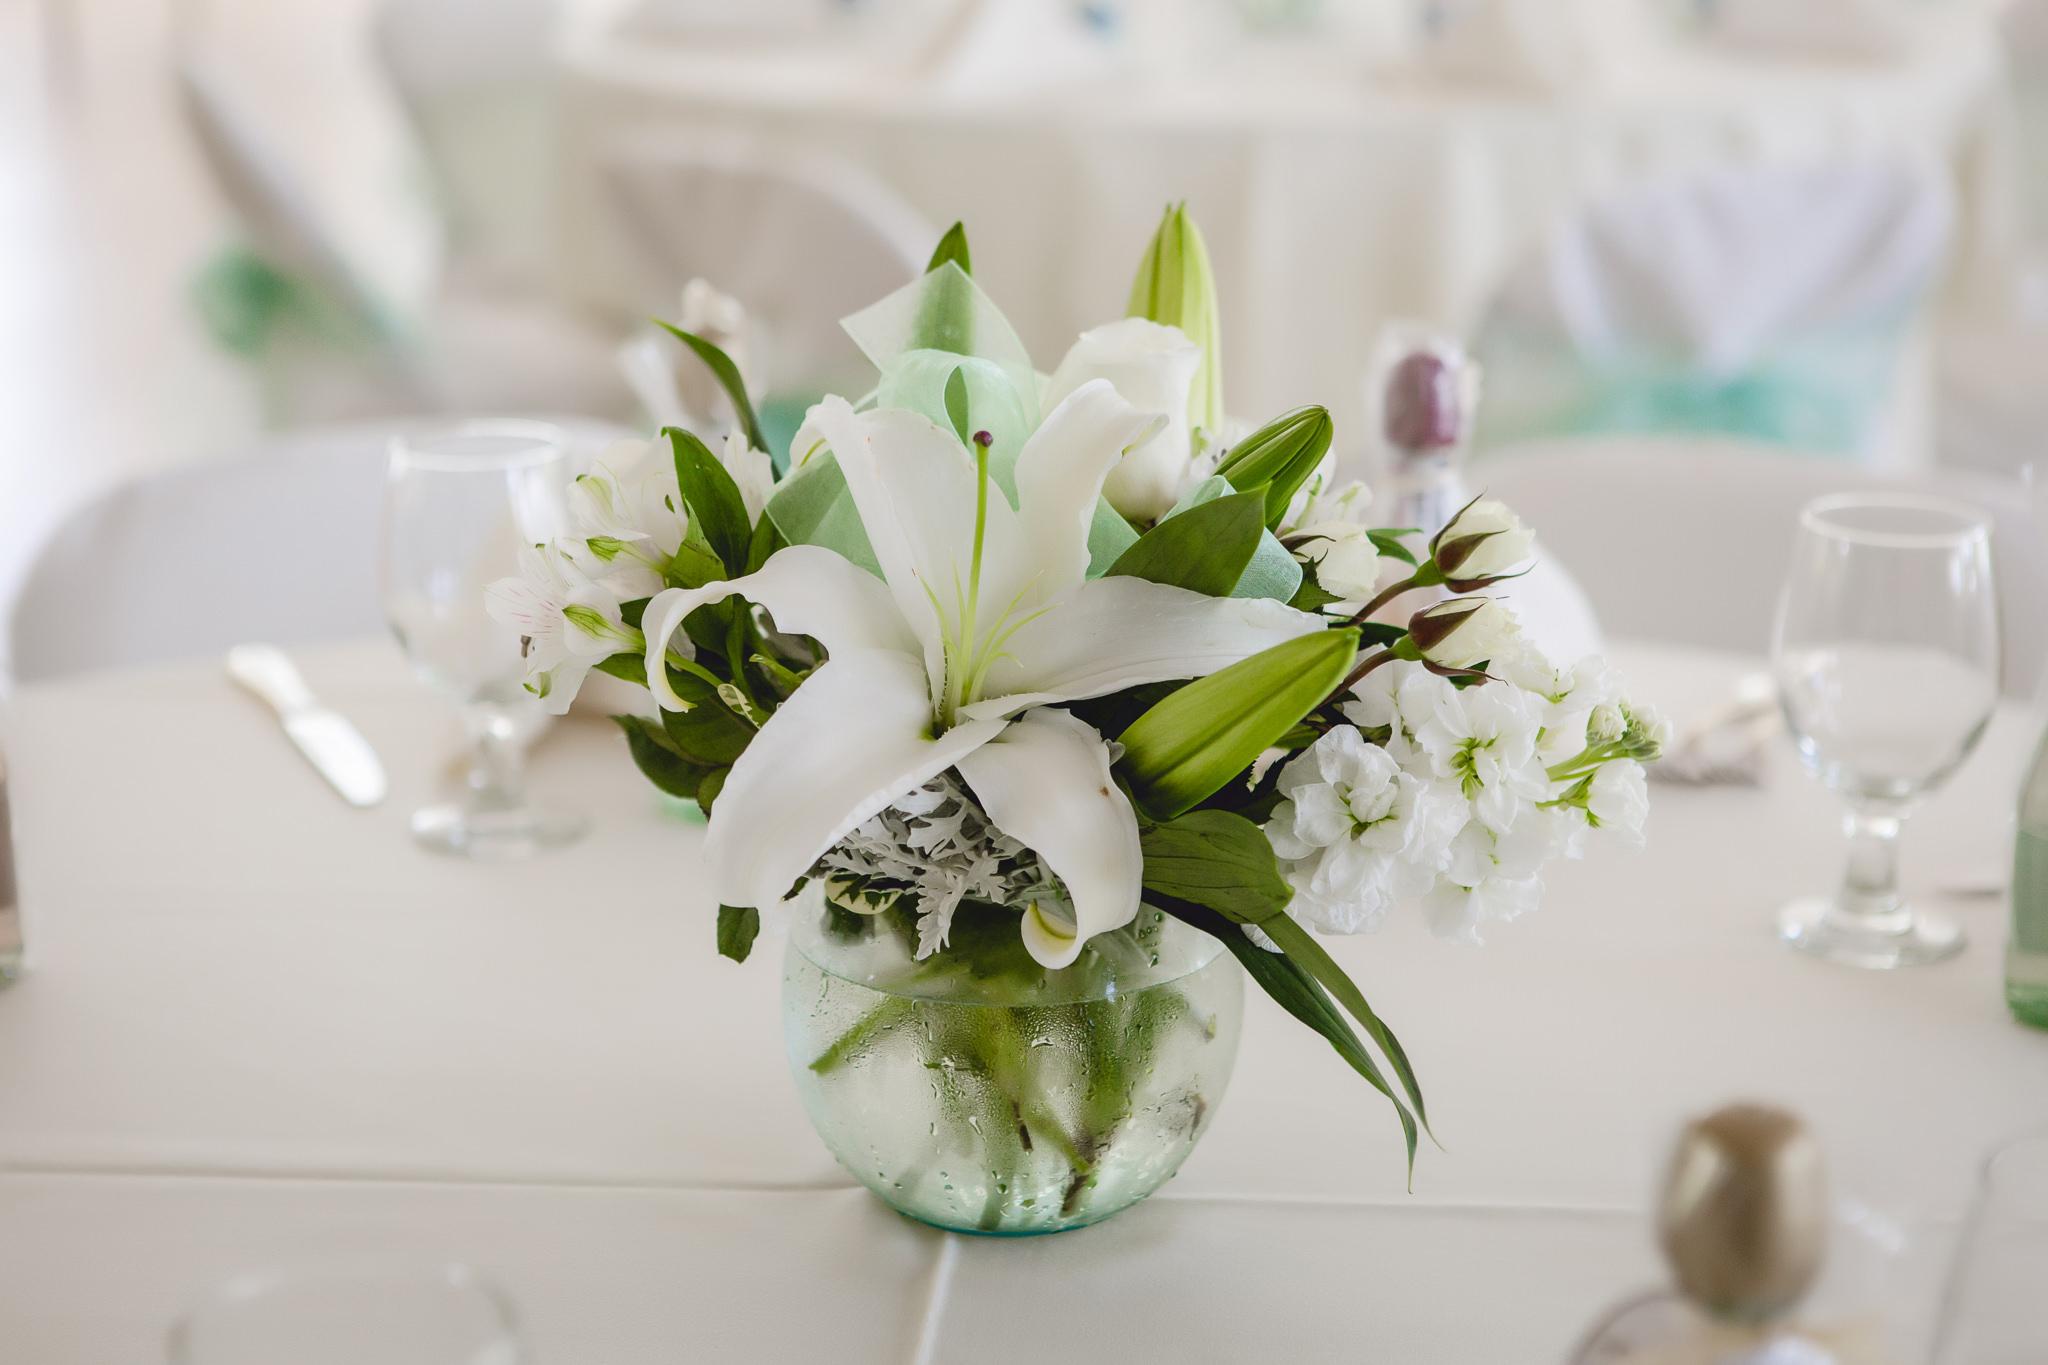 Floral centerpiece by Weischedel Florist at Greystone Fields